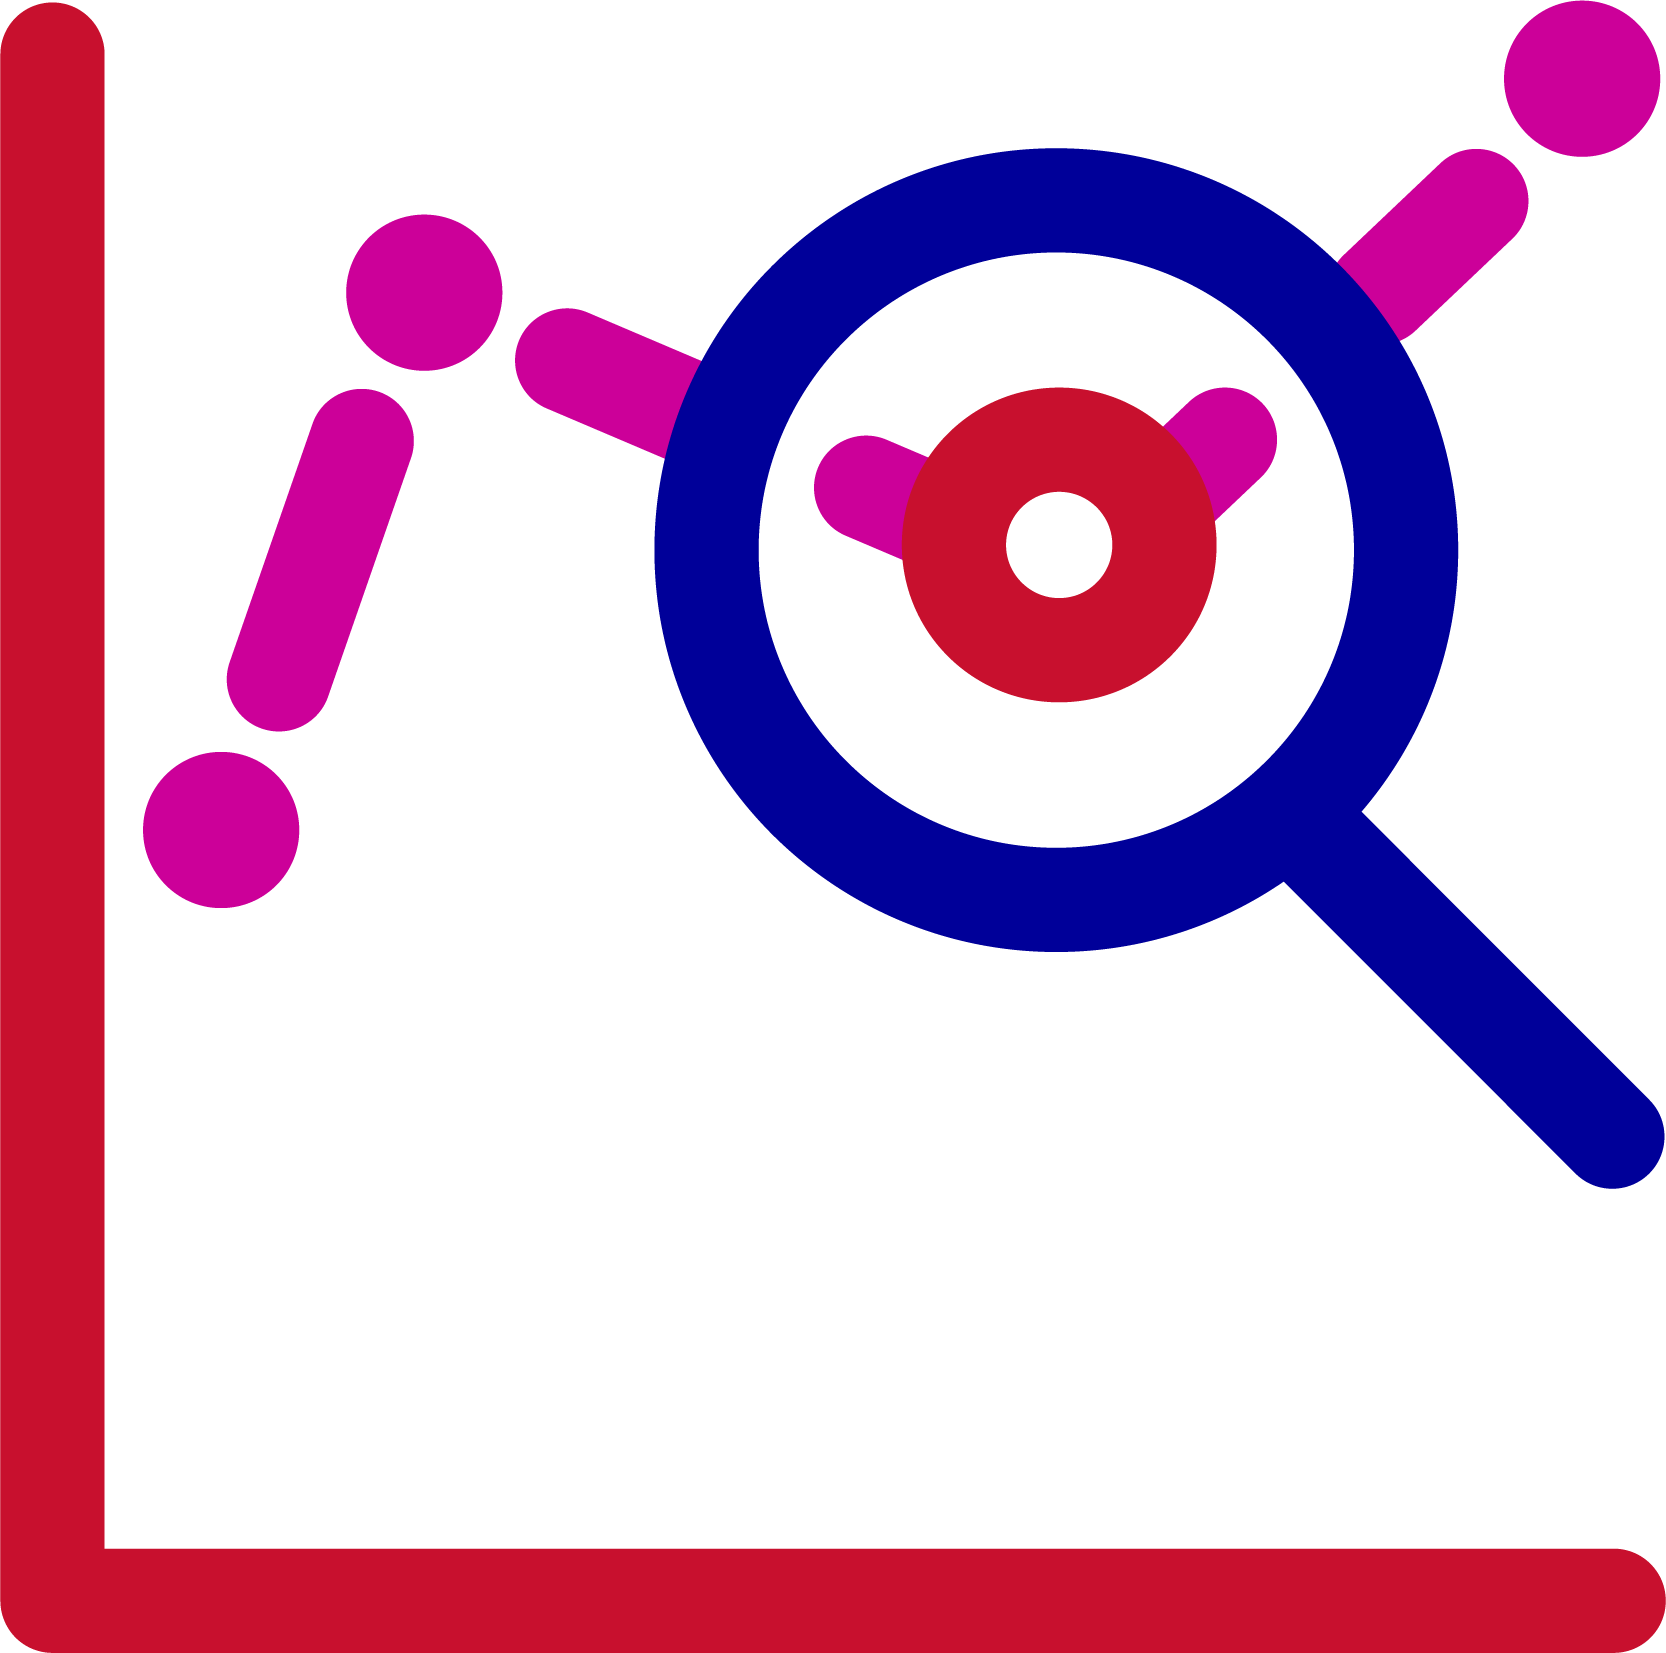 jnj_icon_innovation_analysis_multi_rgbpng_jnjiconinnovationanalysismultirgb.png